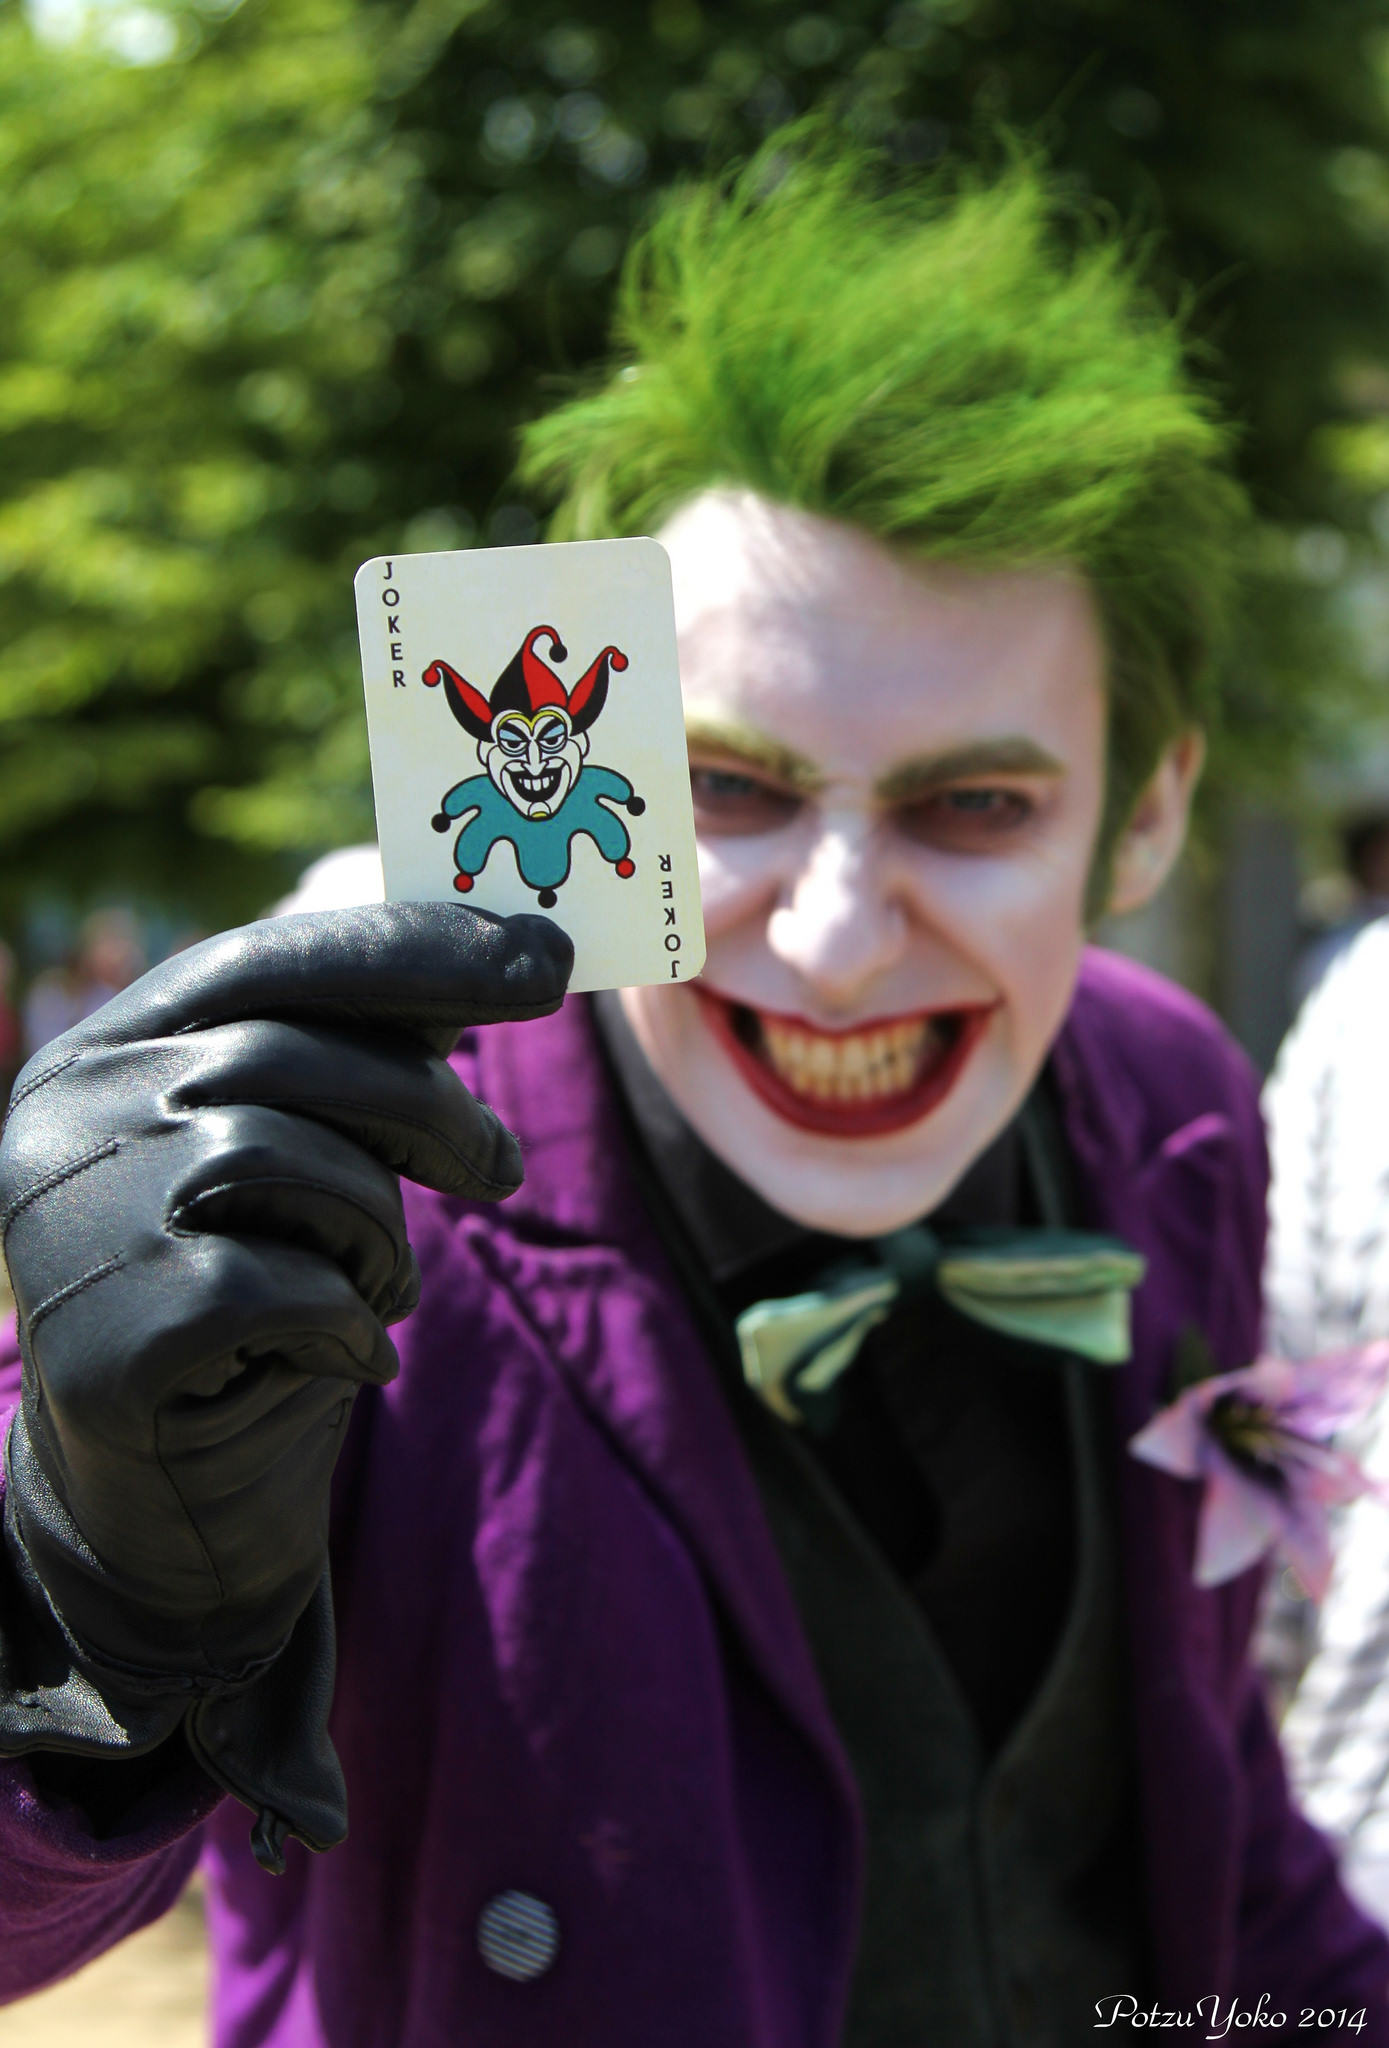 The Joker Halloween Costumes